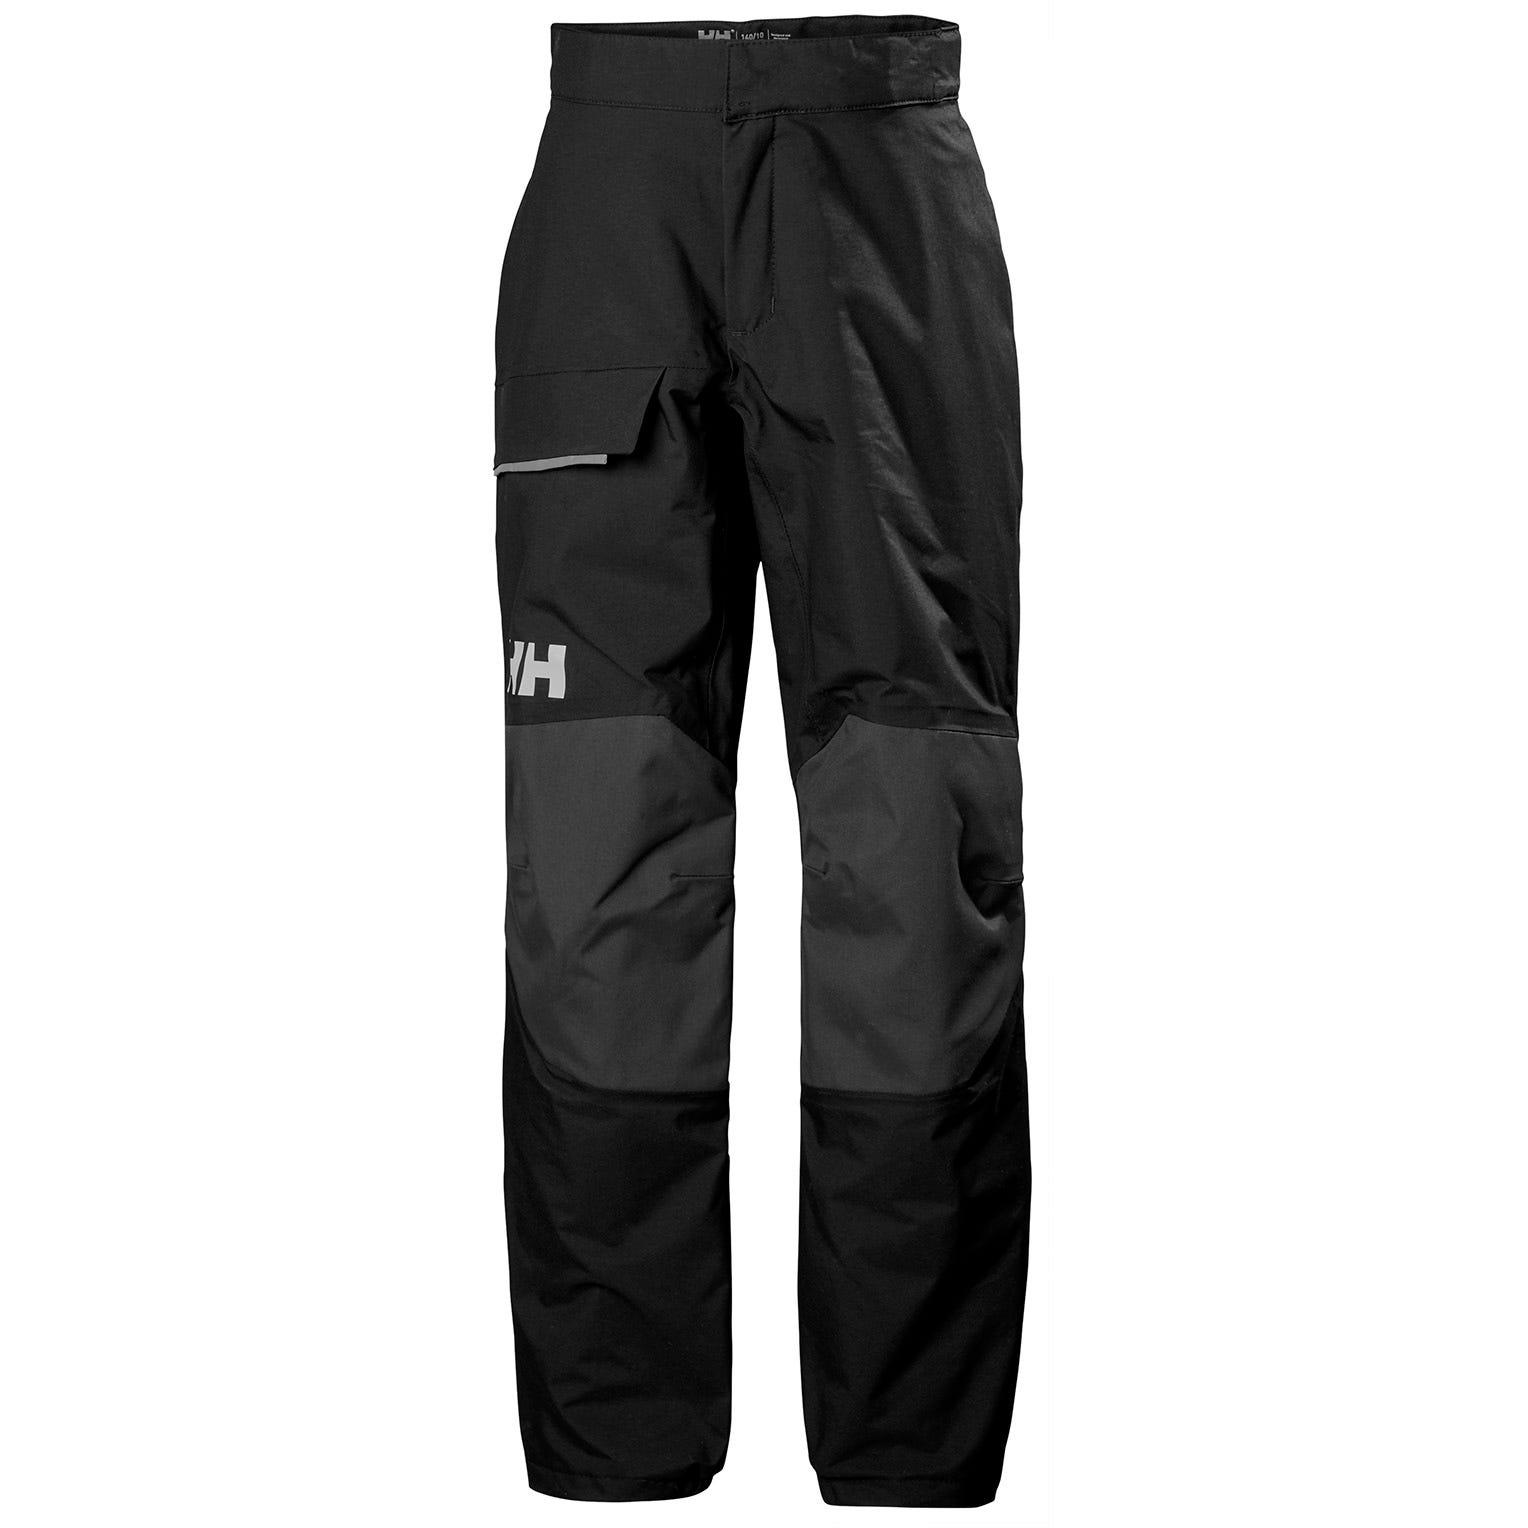 Helly Hansen Junior Border Pant Kids Black 140/10